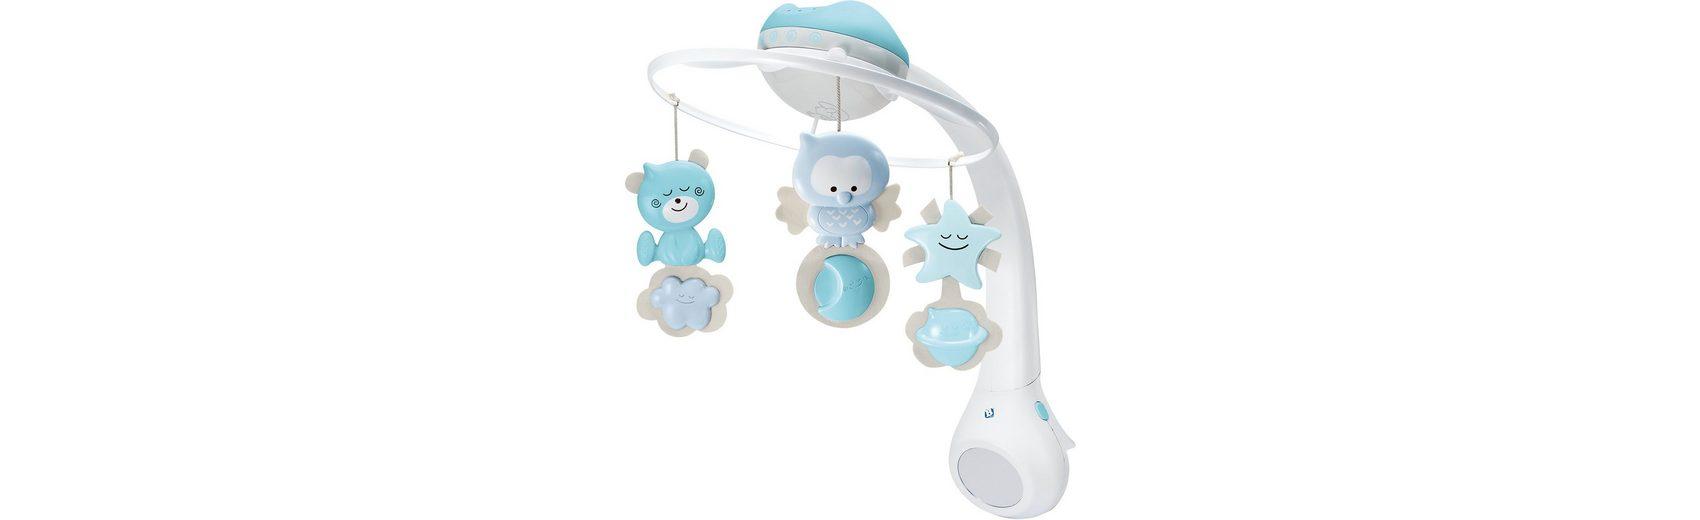 BKids 3 in 1 Musikmobile mit Traumlampe, blau